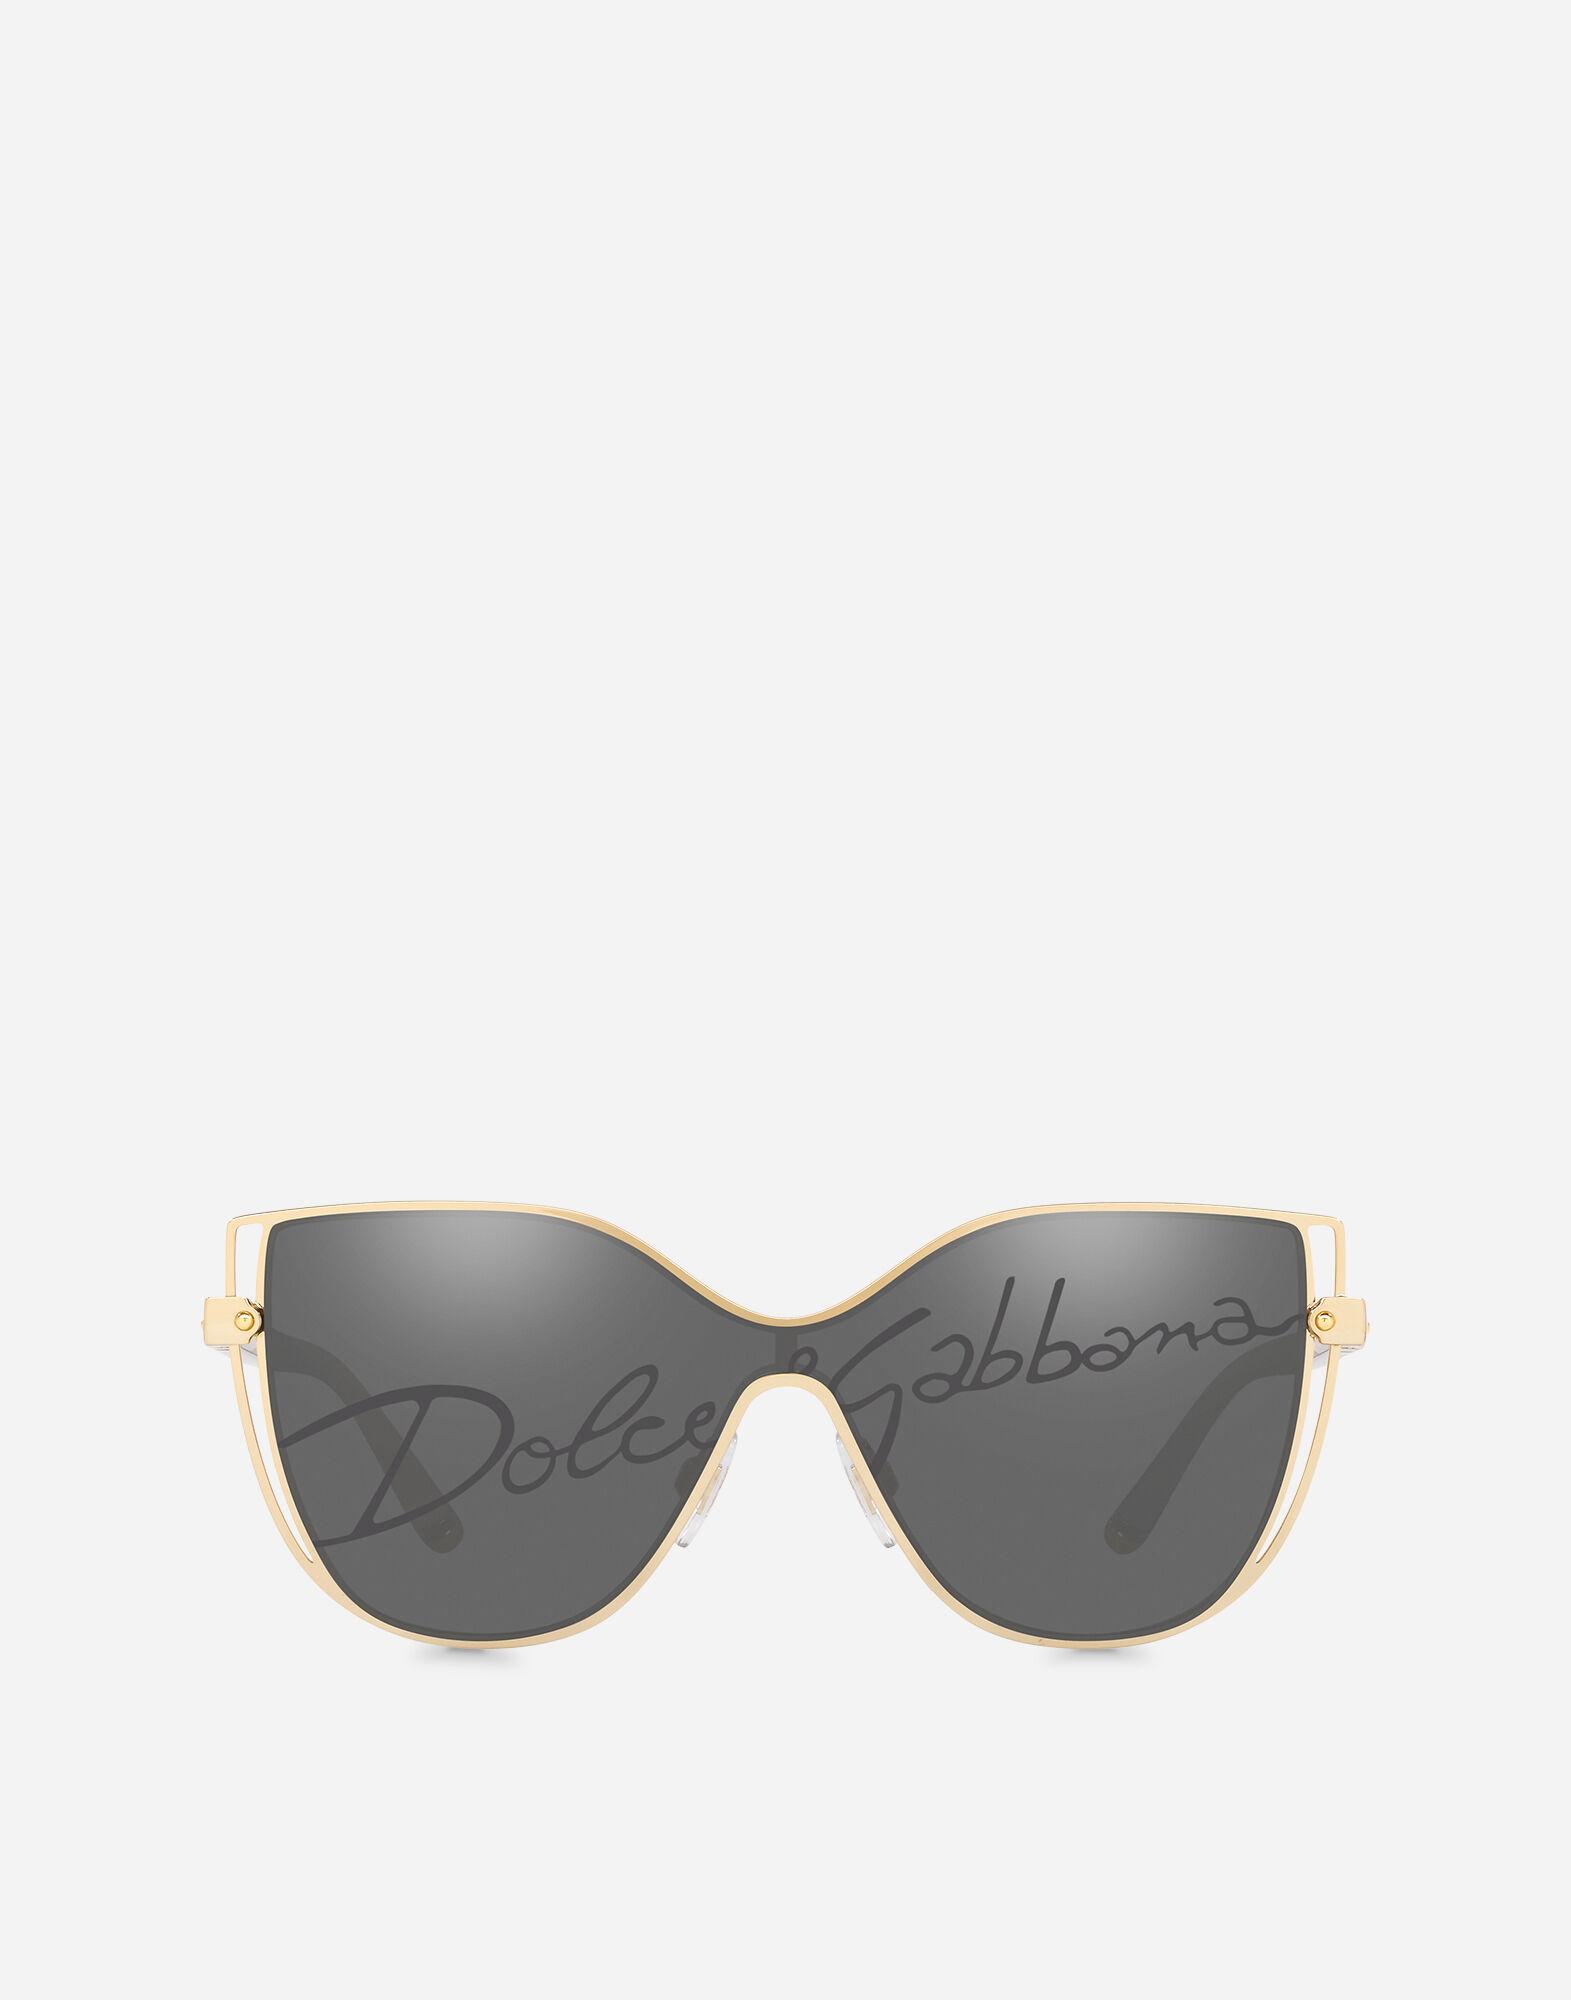 amp;gabbana Women's SunglassesDolce amp;gabbana SunglassesDolce Women's amp;gabbana Women's SunglassesDolce Women's LSGpUqVzM